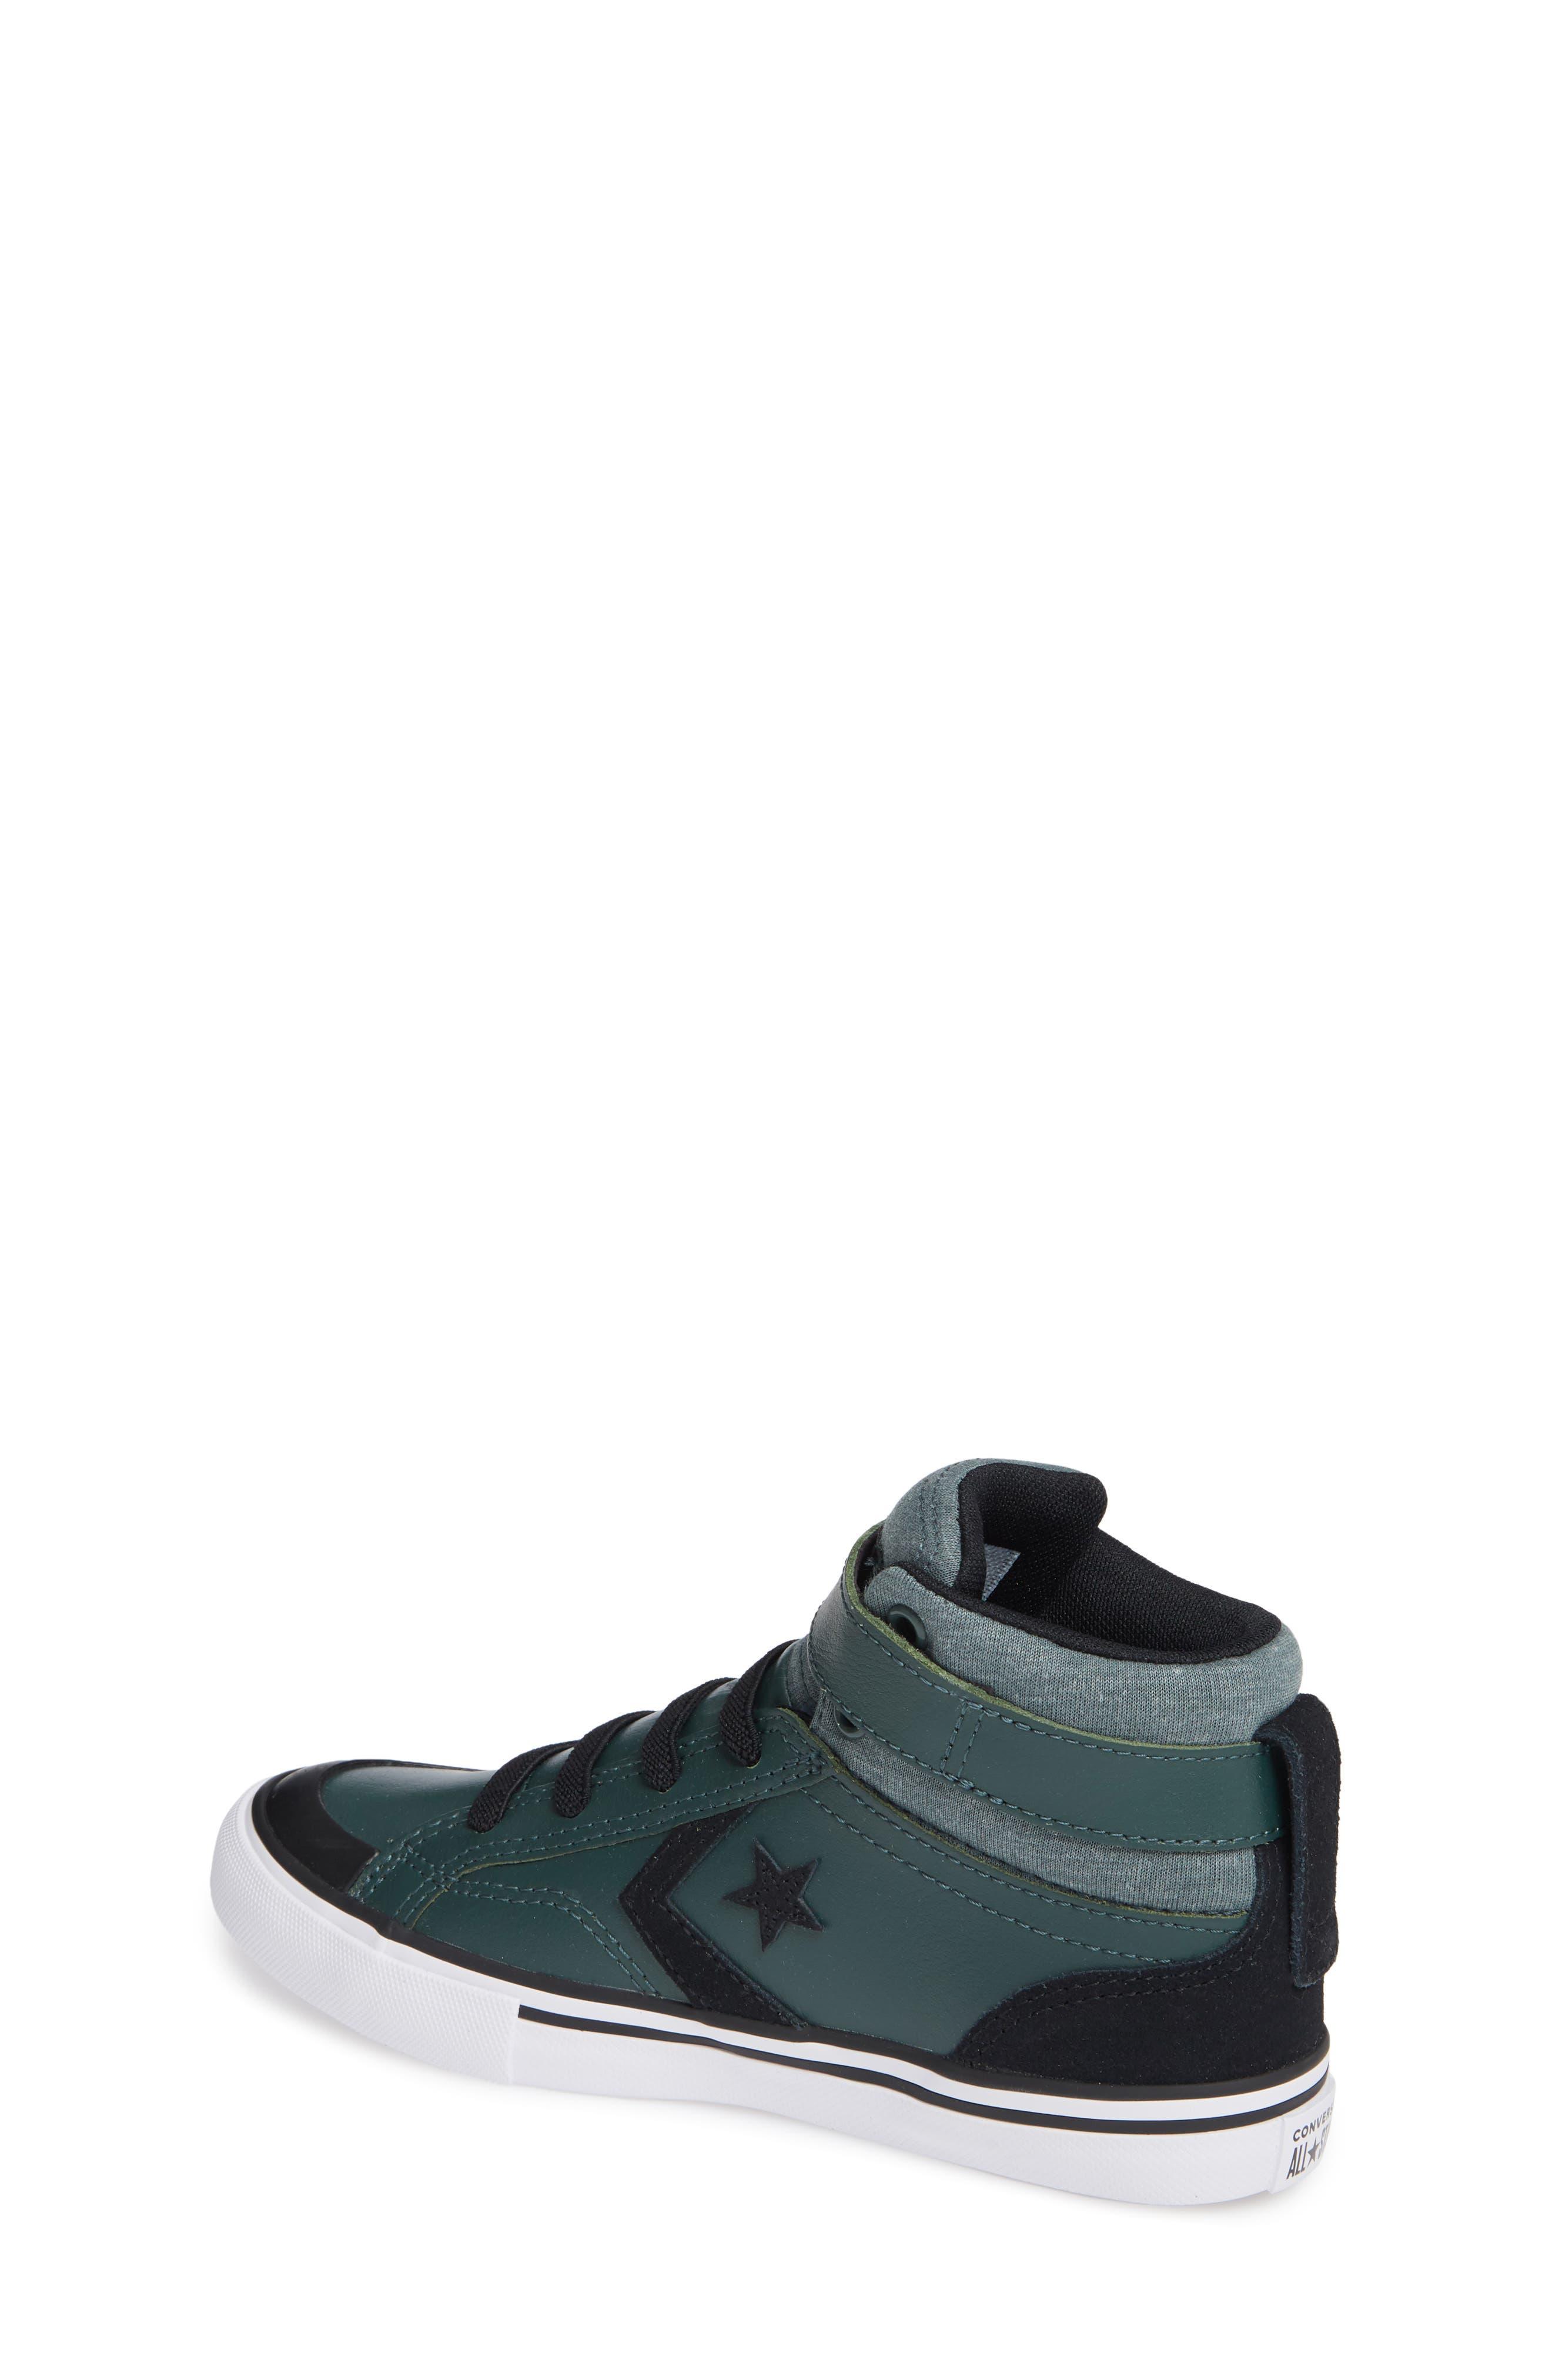 Pro Blaze High Top Sneaker,                             Alternate thumbnail 2, color,                             VINTAGE GREEN